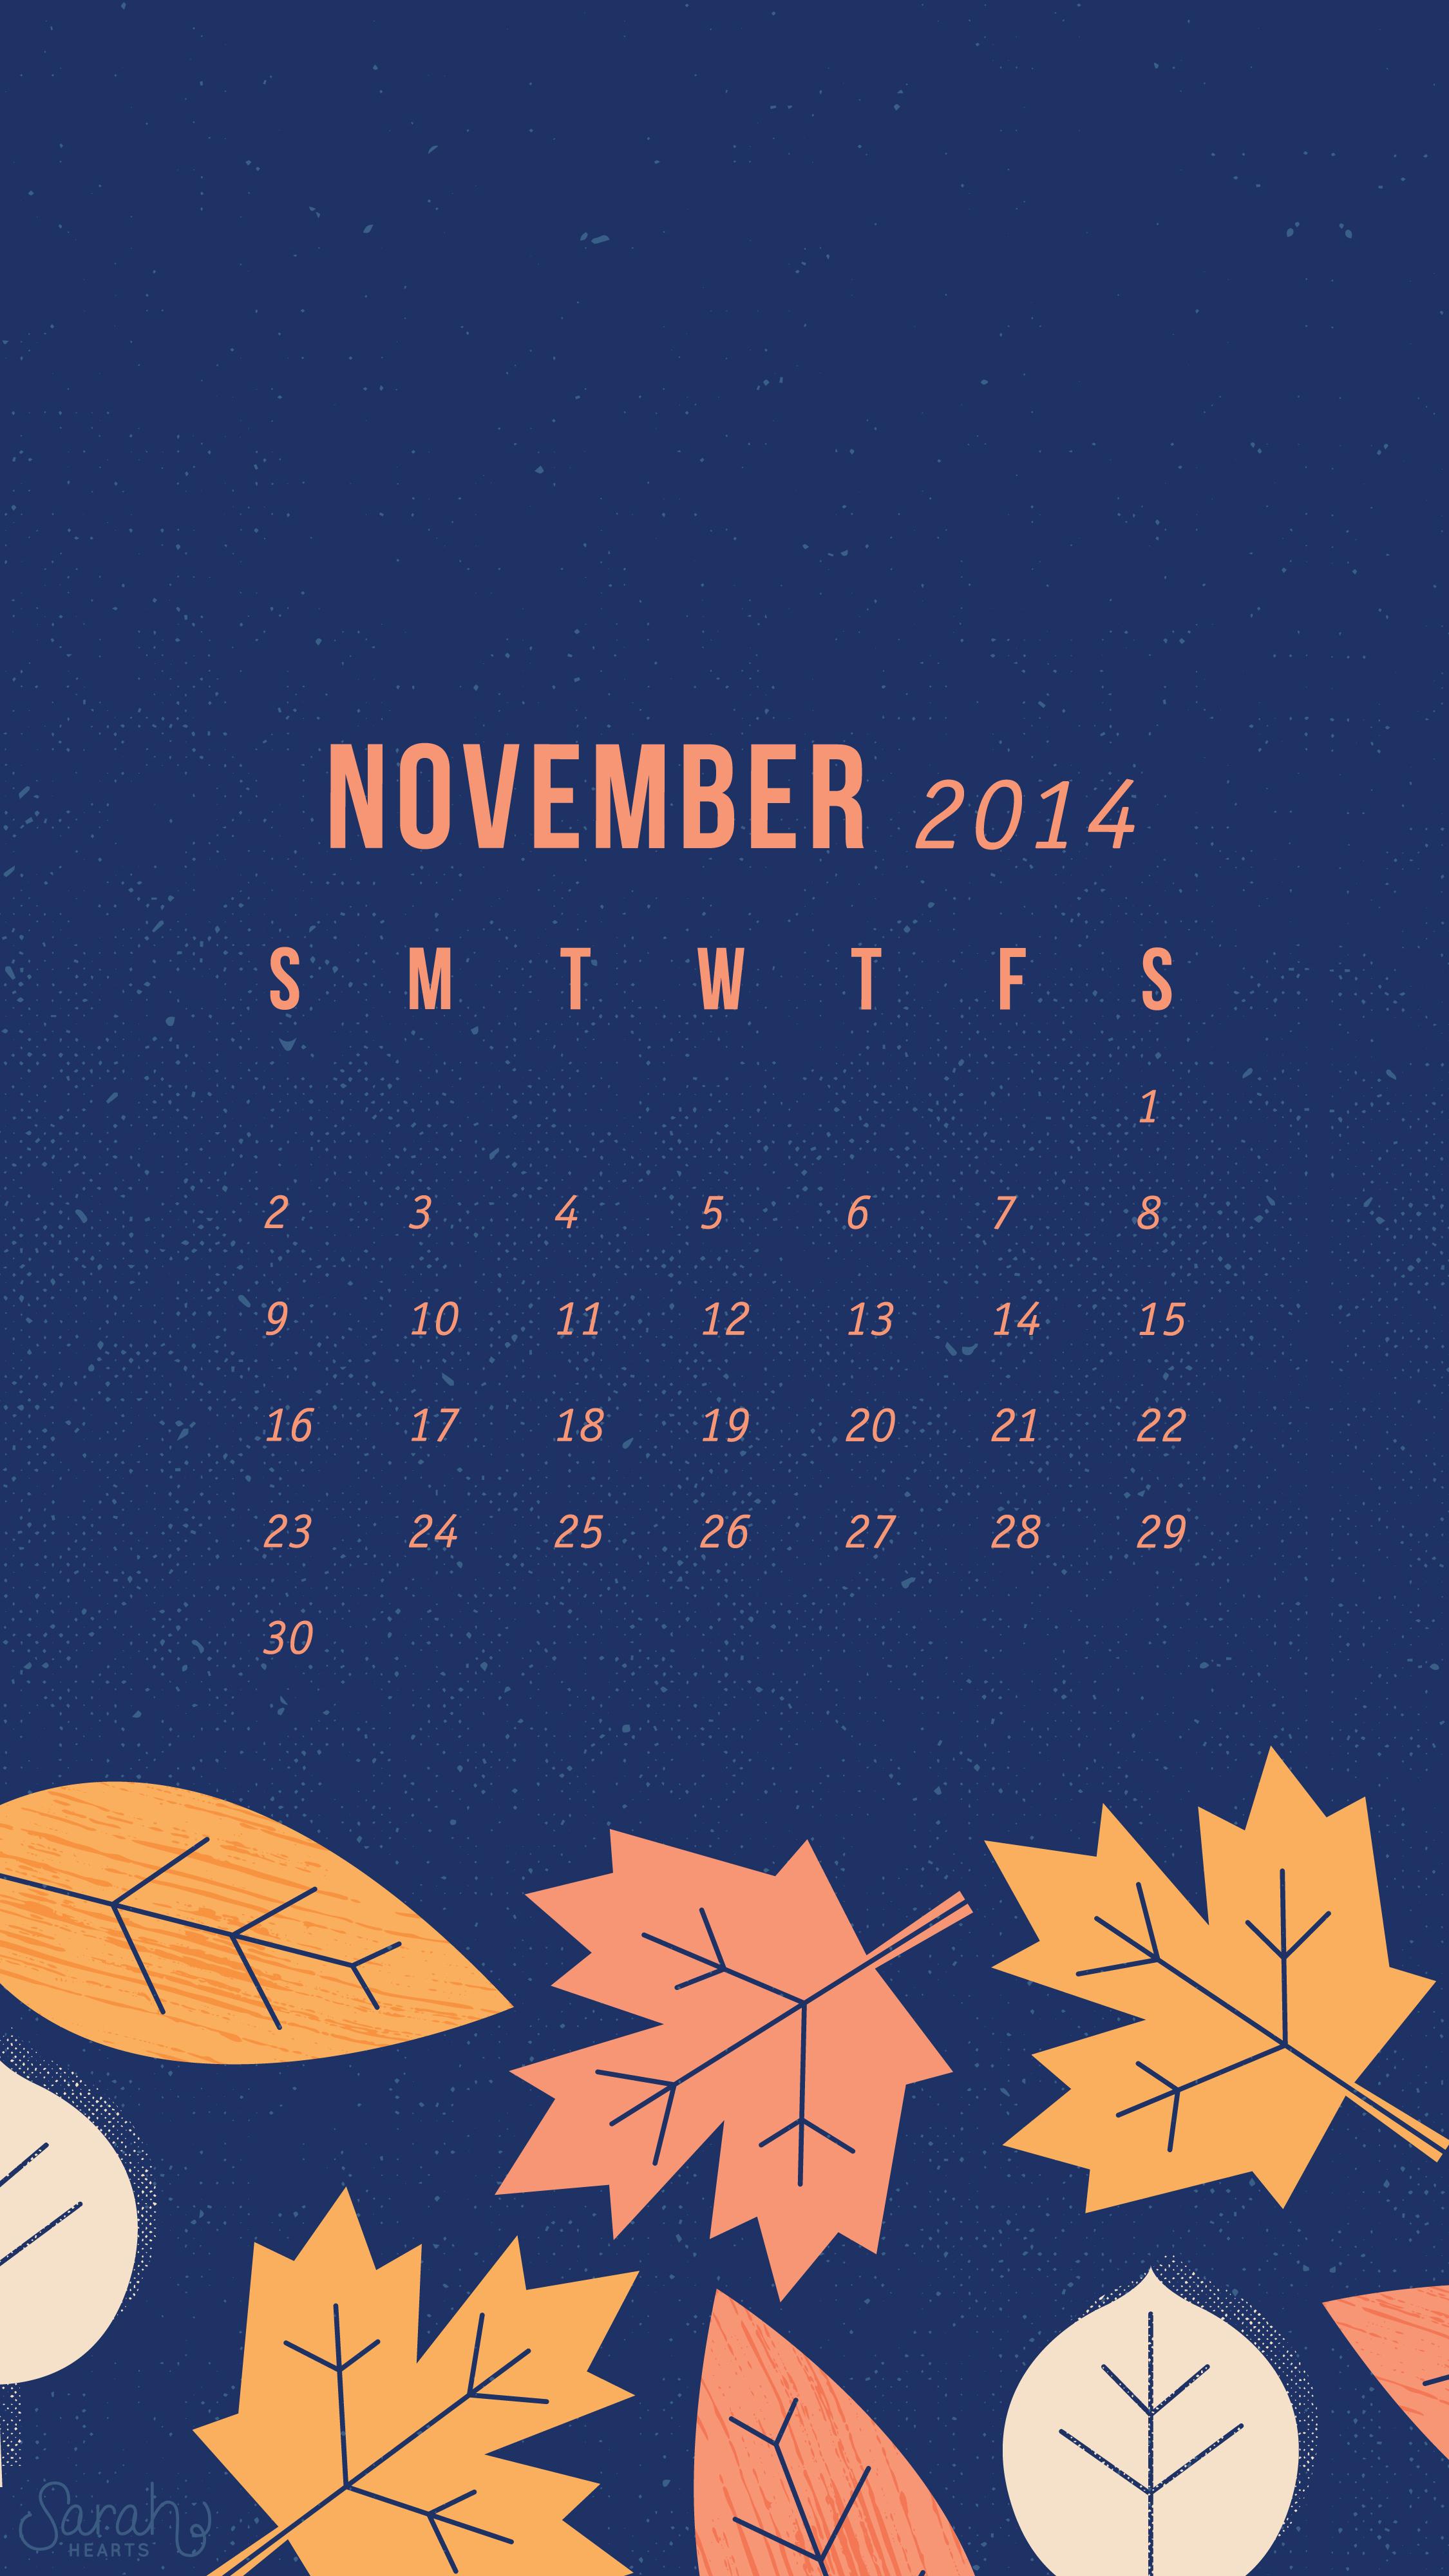 Calendar Iphone Wallpaper : November calendar wallpapers sarah hearts